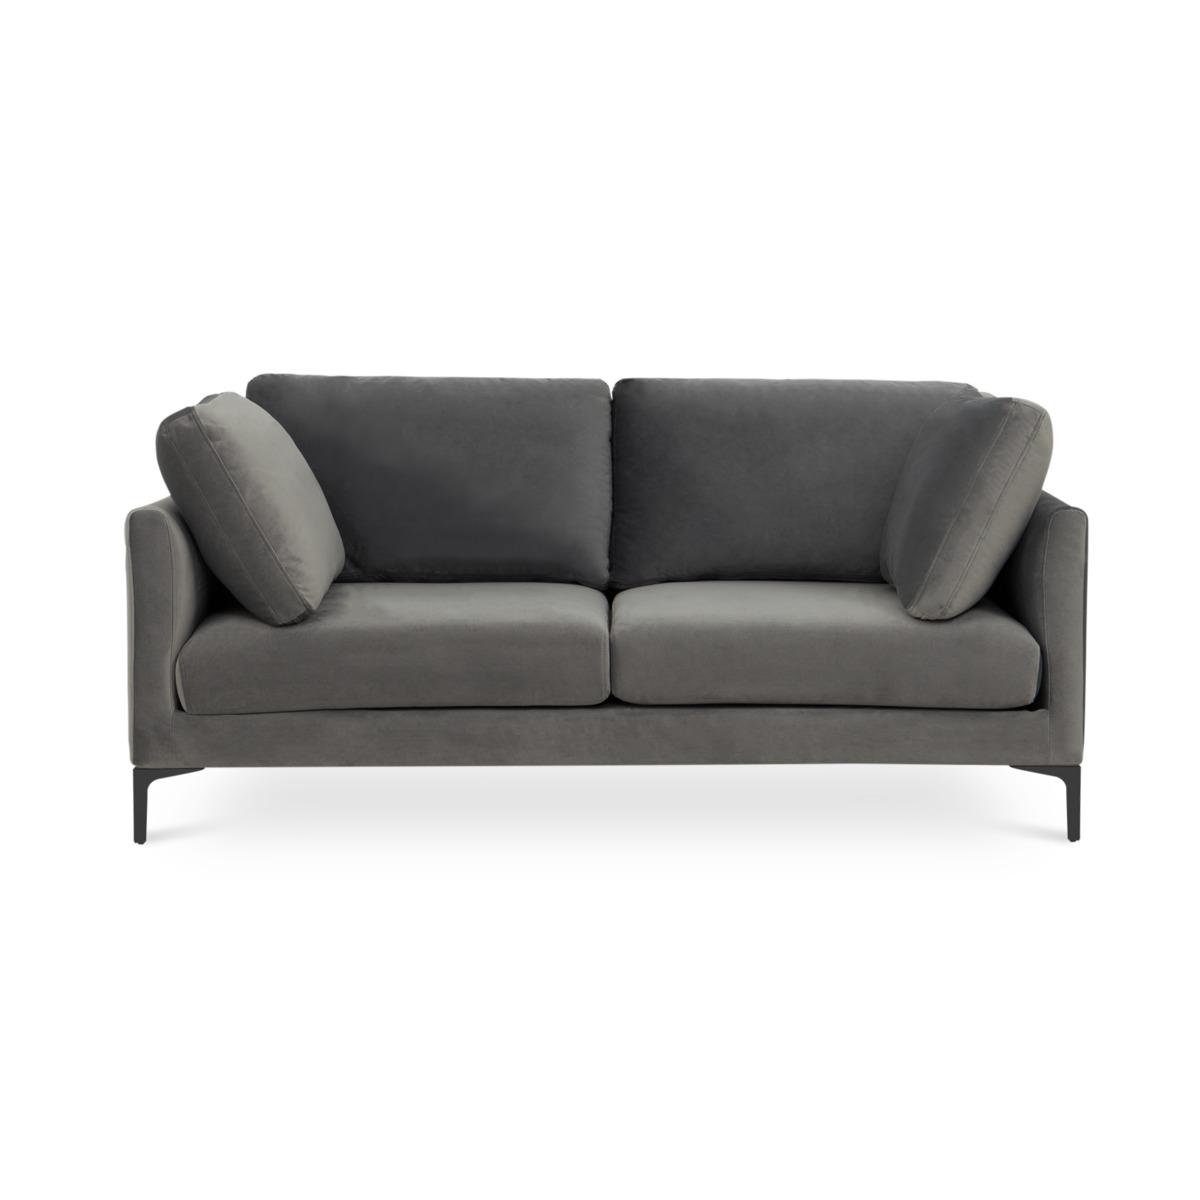 Adams 2 Seater Sofa, Fog Grey Velvet (Black Leg)